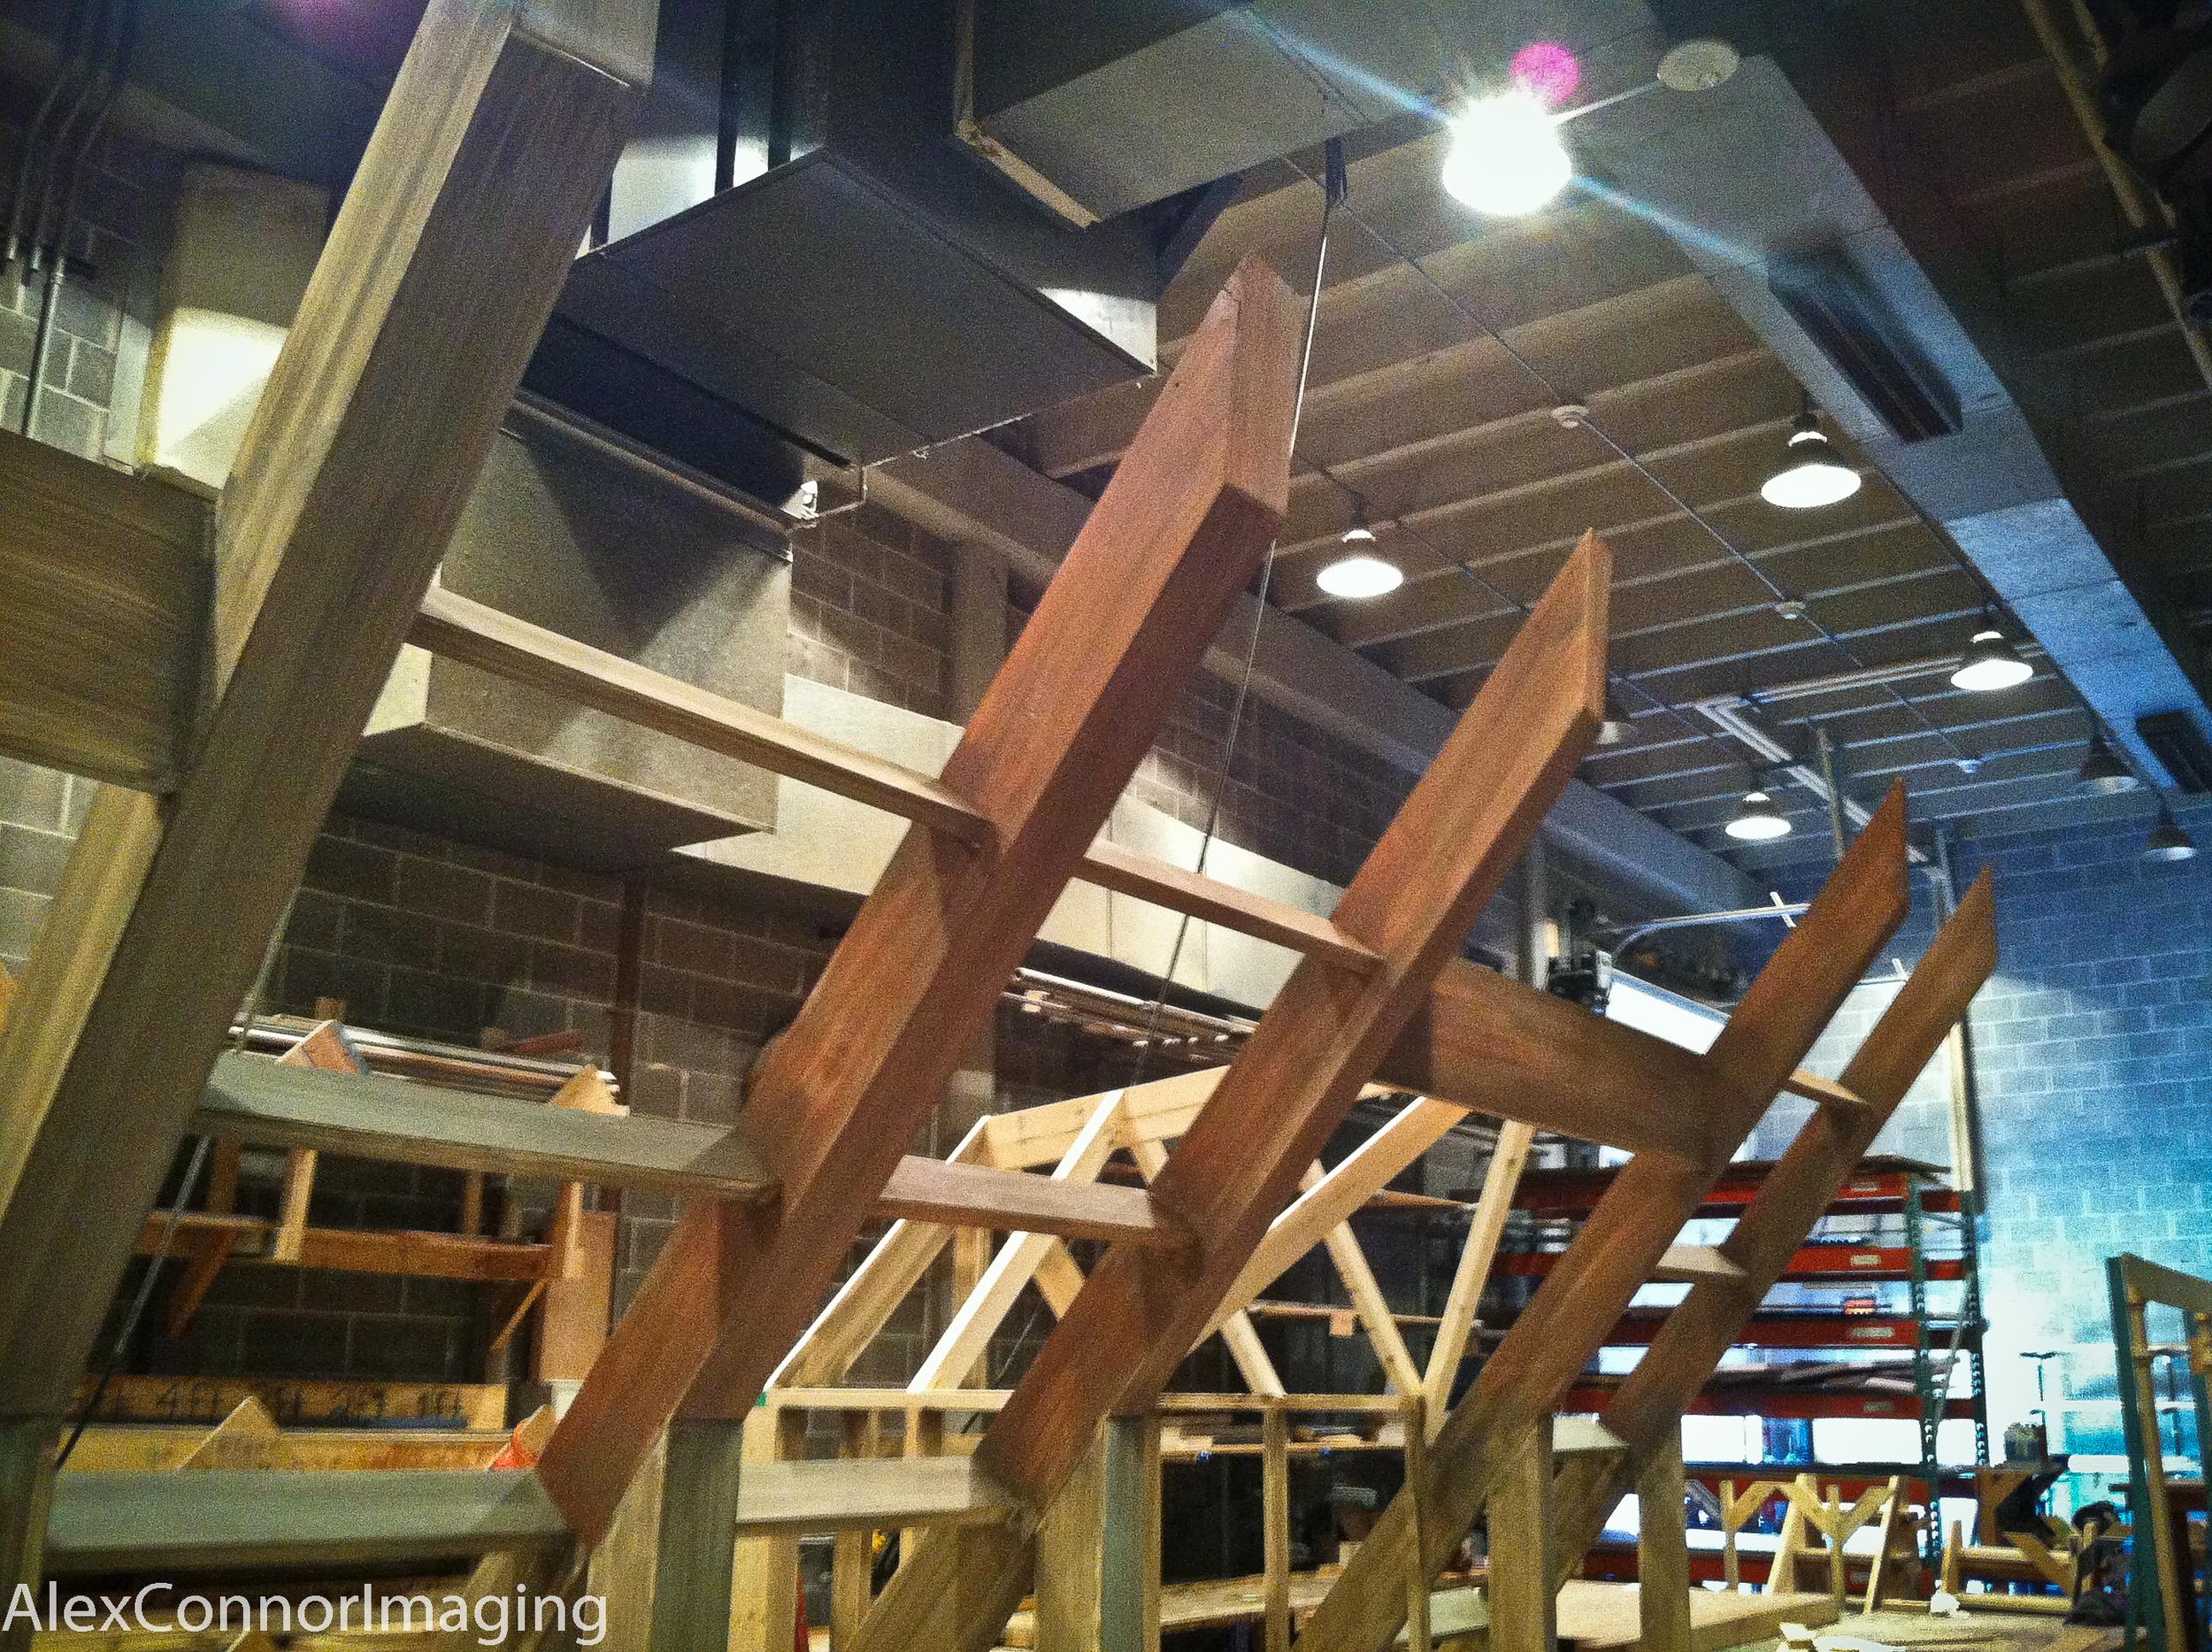 Second step wood grain